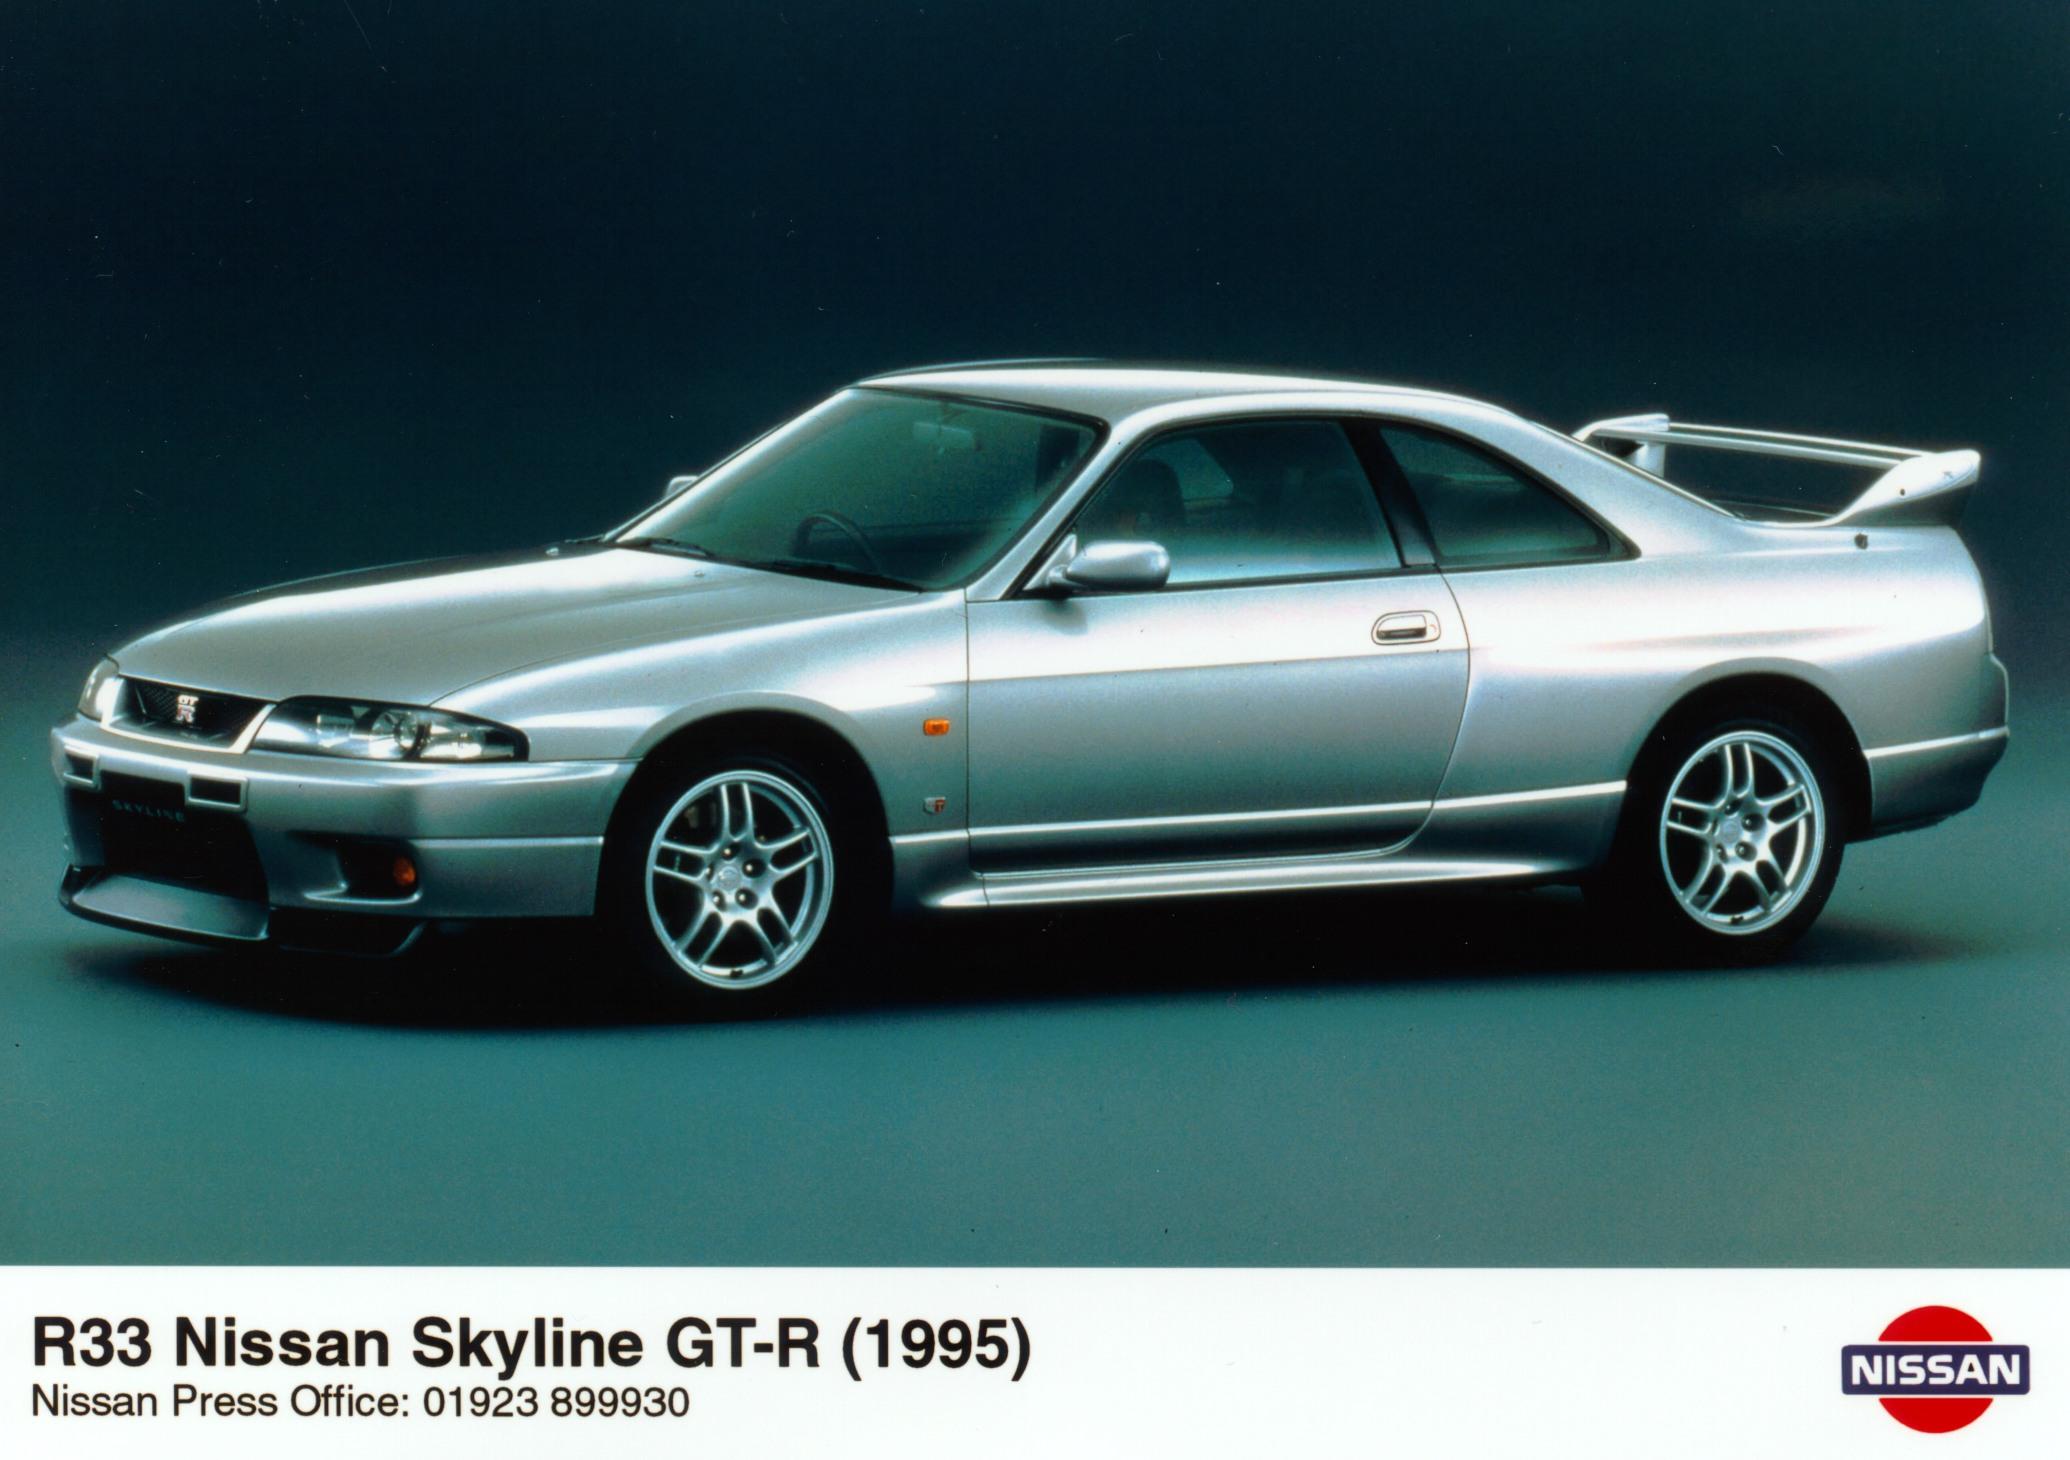 Nissan GT-R Chronology: R32-R35 | Joel Strickland's Blog